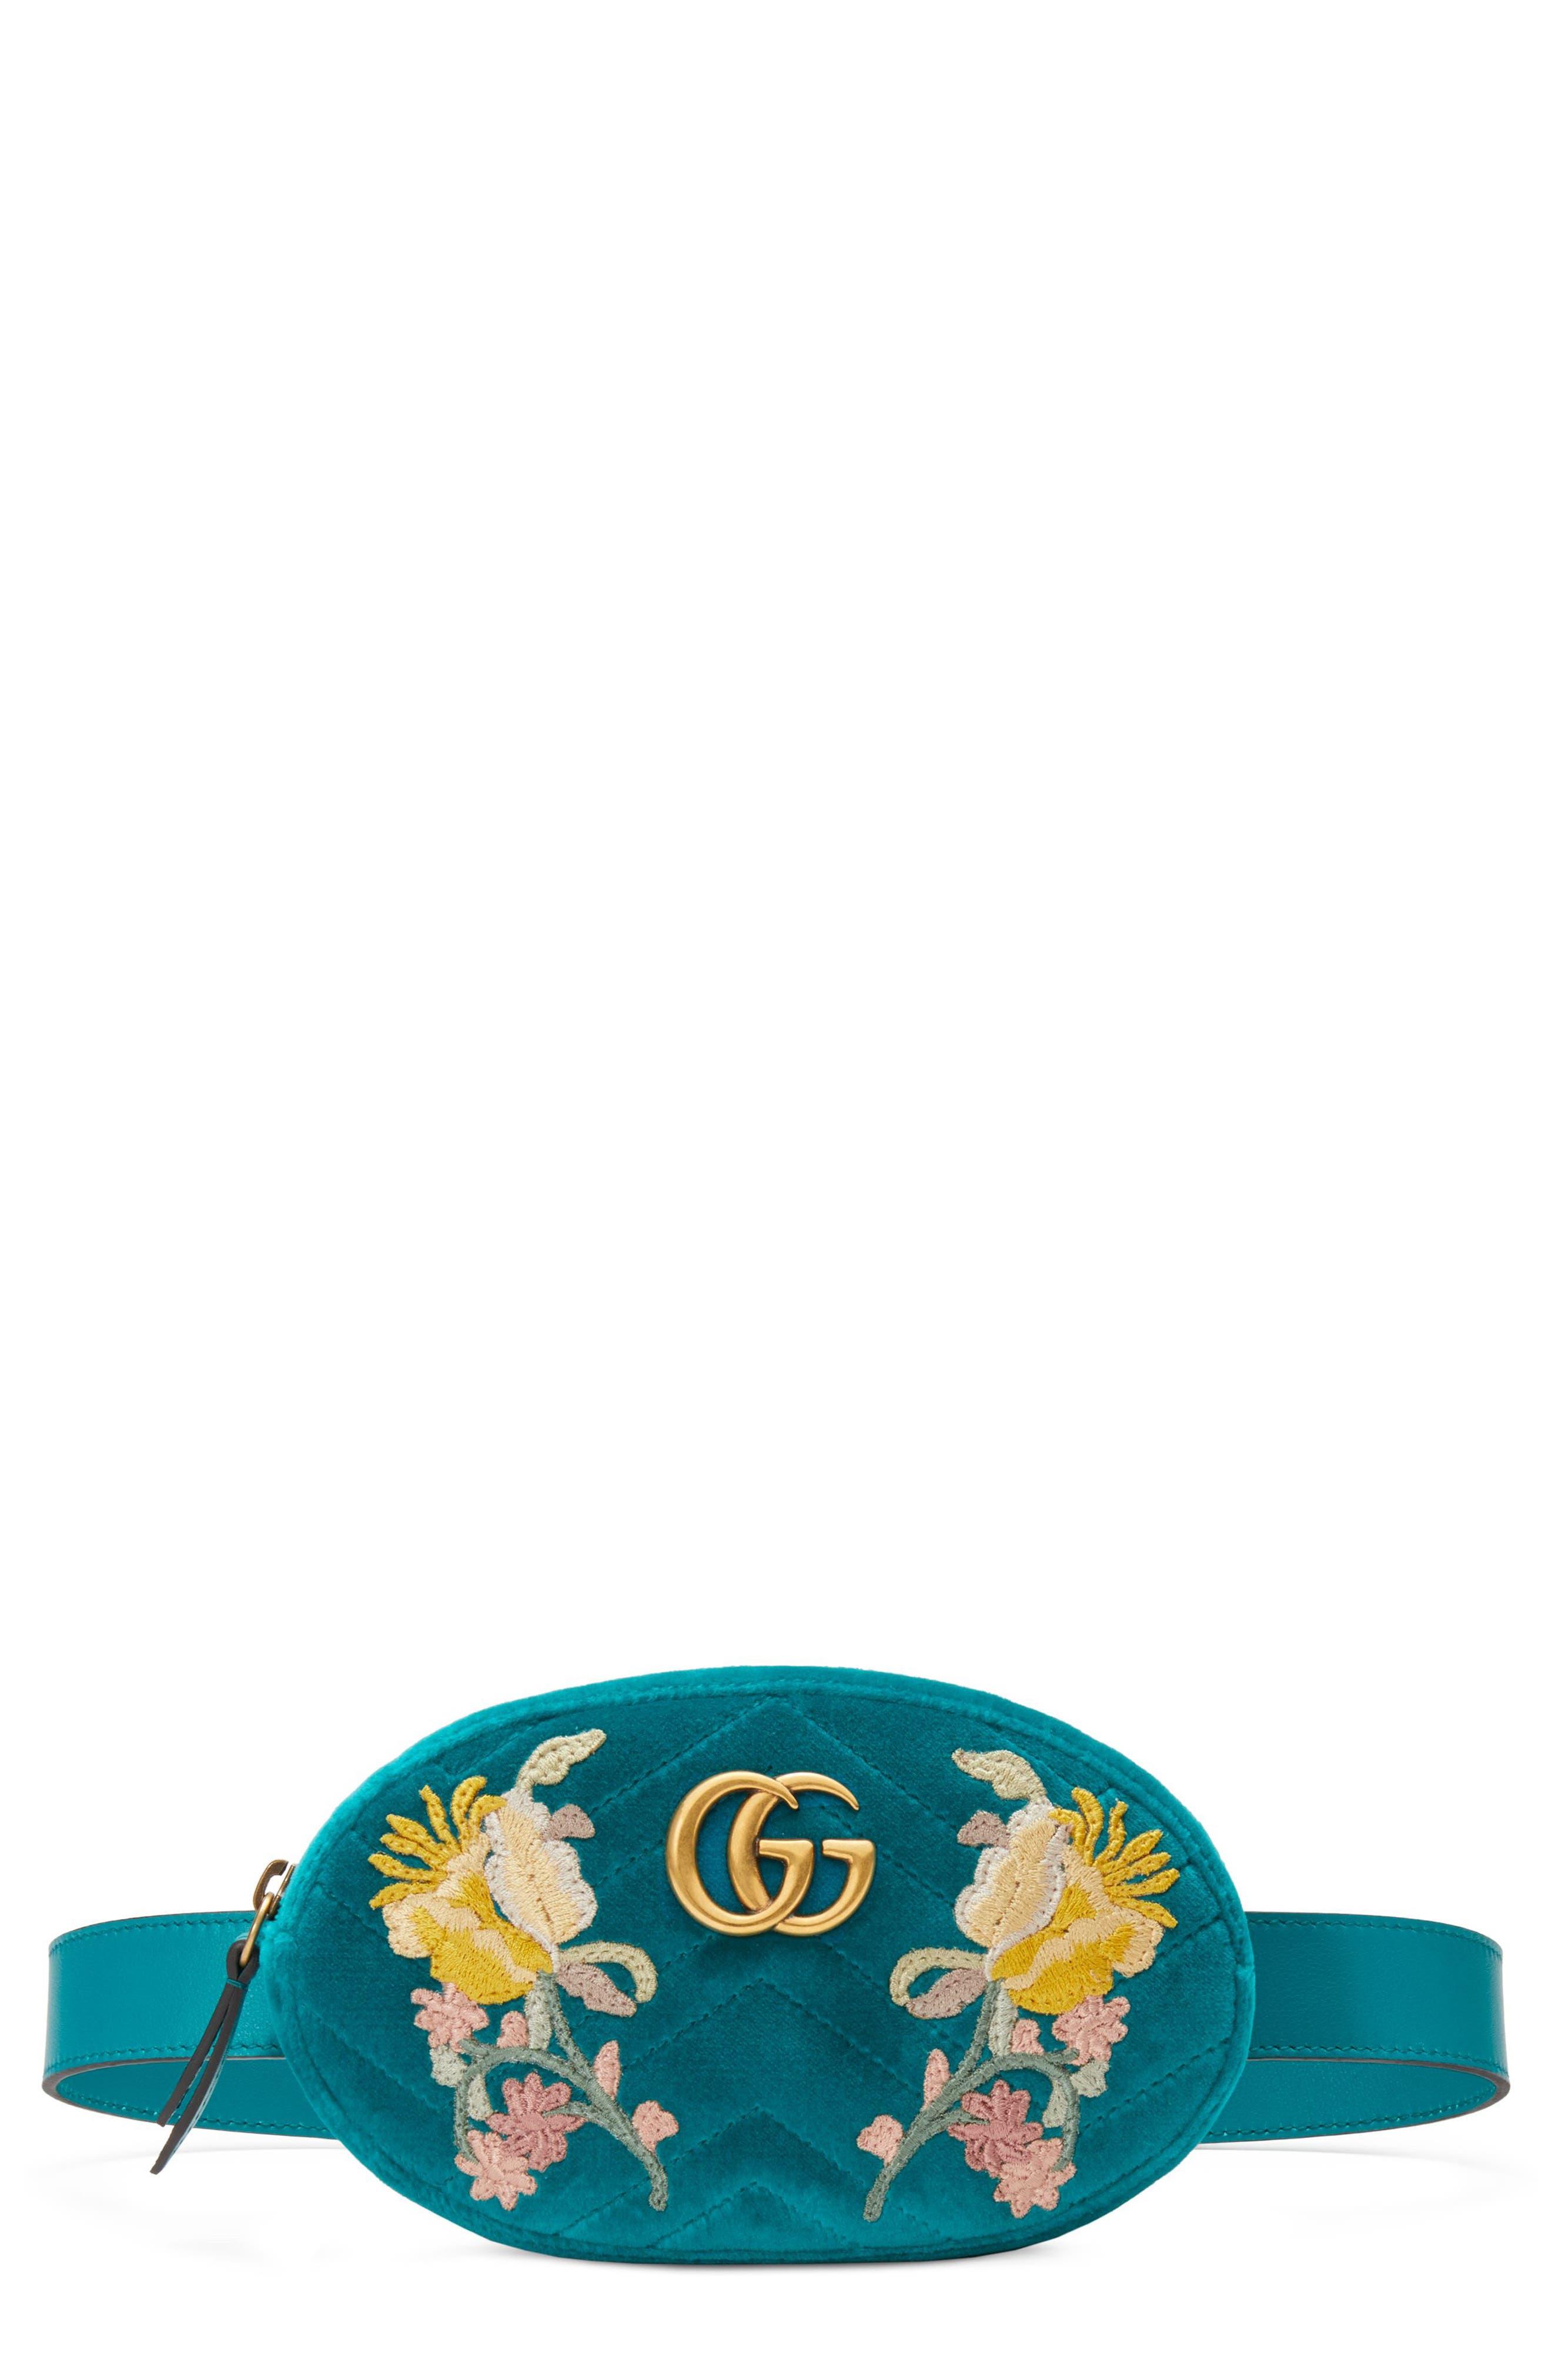 GG Marmont 2.0 Embroidered Velvet Belt Bag,                             Main thumbnail 1, color,                             Pavone/ Pavone/ Cyan Multi